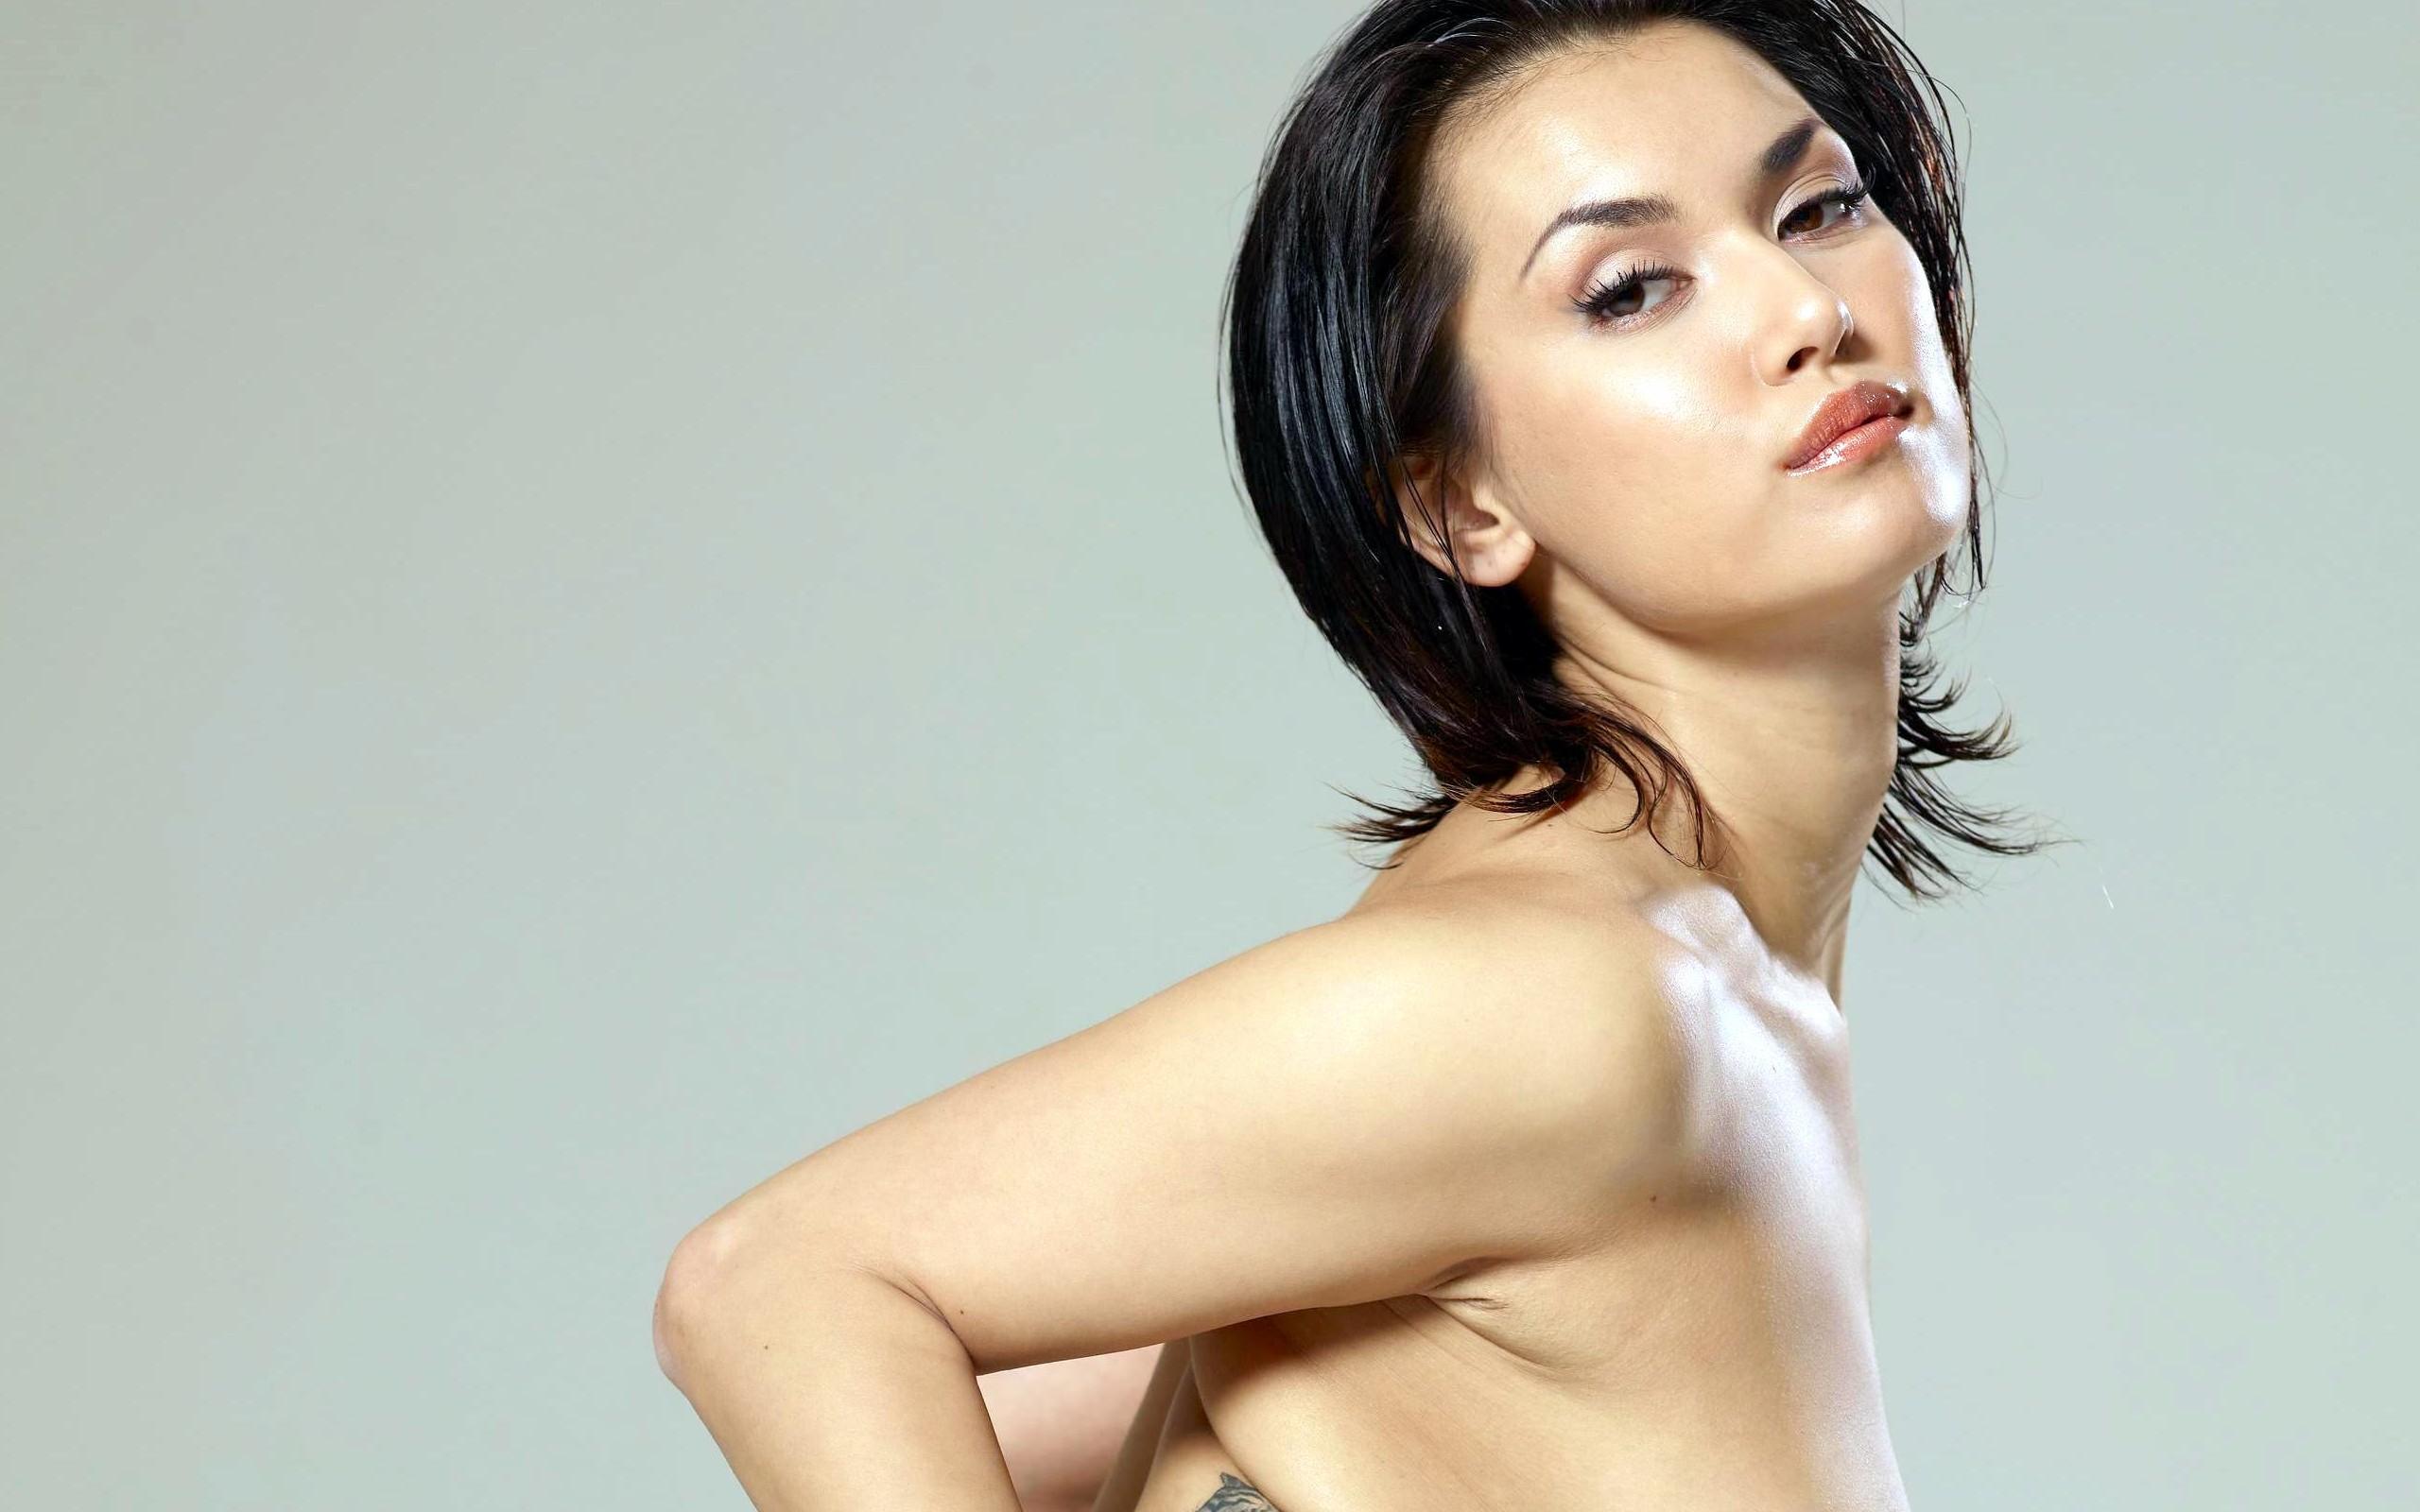 Maria Ozawa Celebrities Female wallpaper